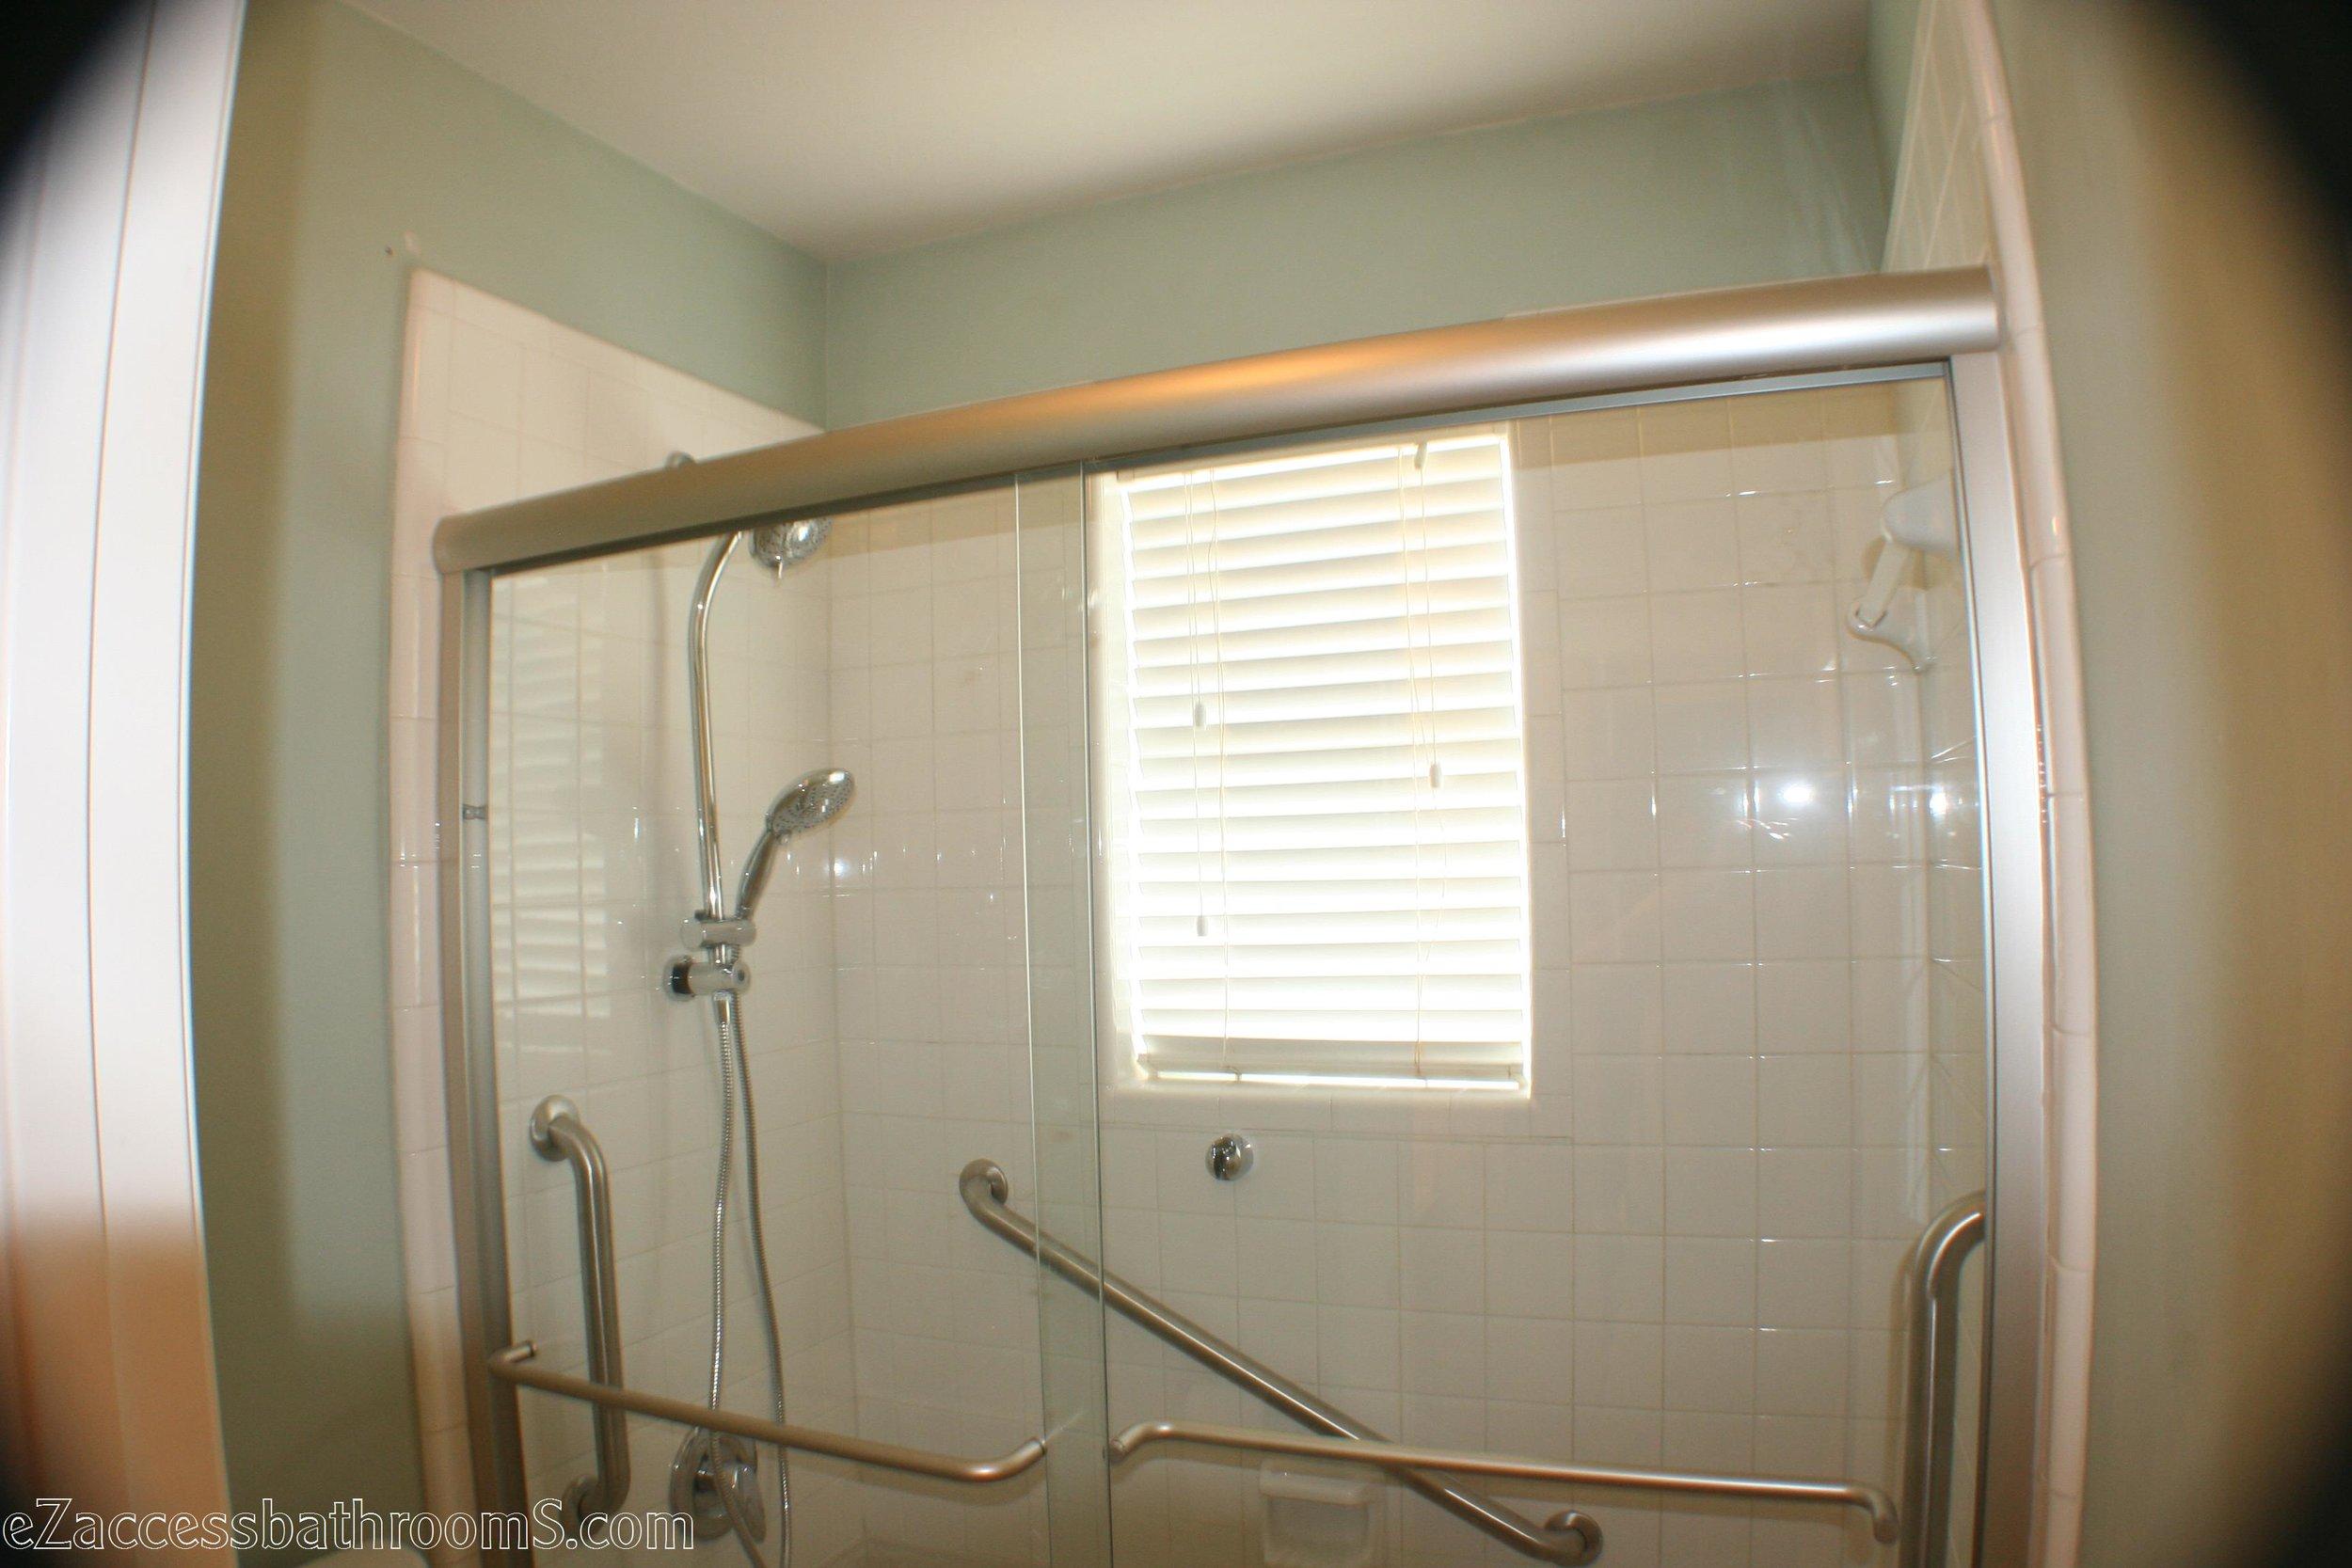 Budget tub to shower conversion ezaccessbathrooms.com 8322028473 012.JPG